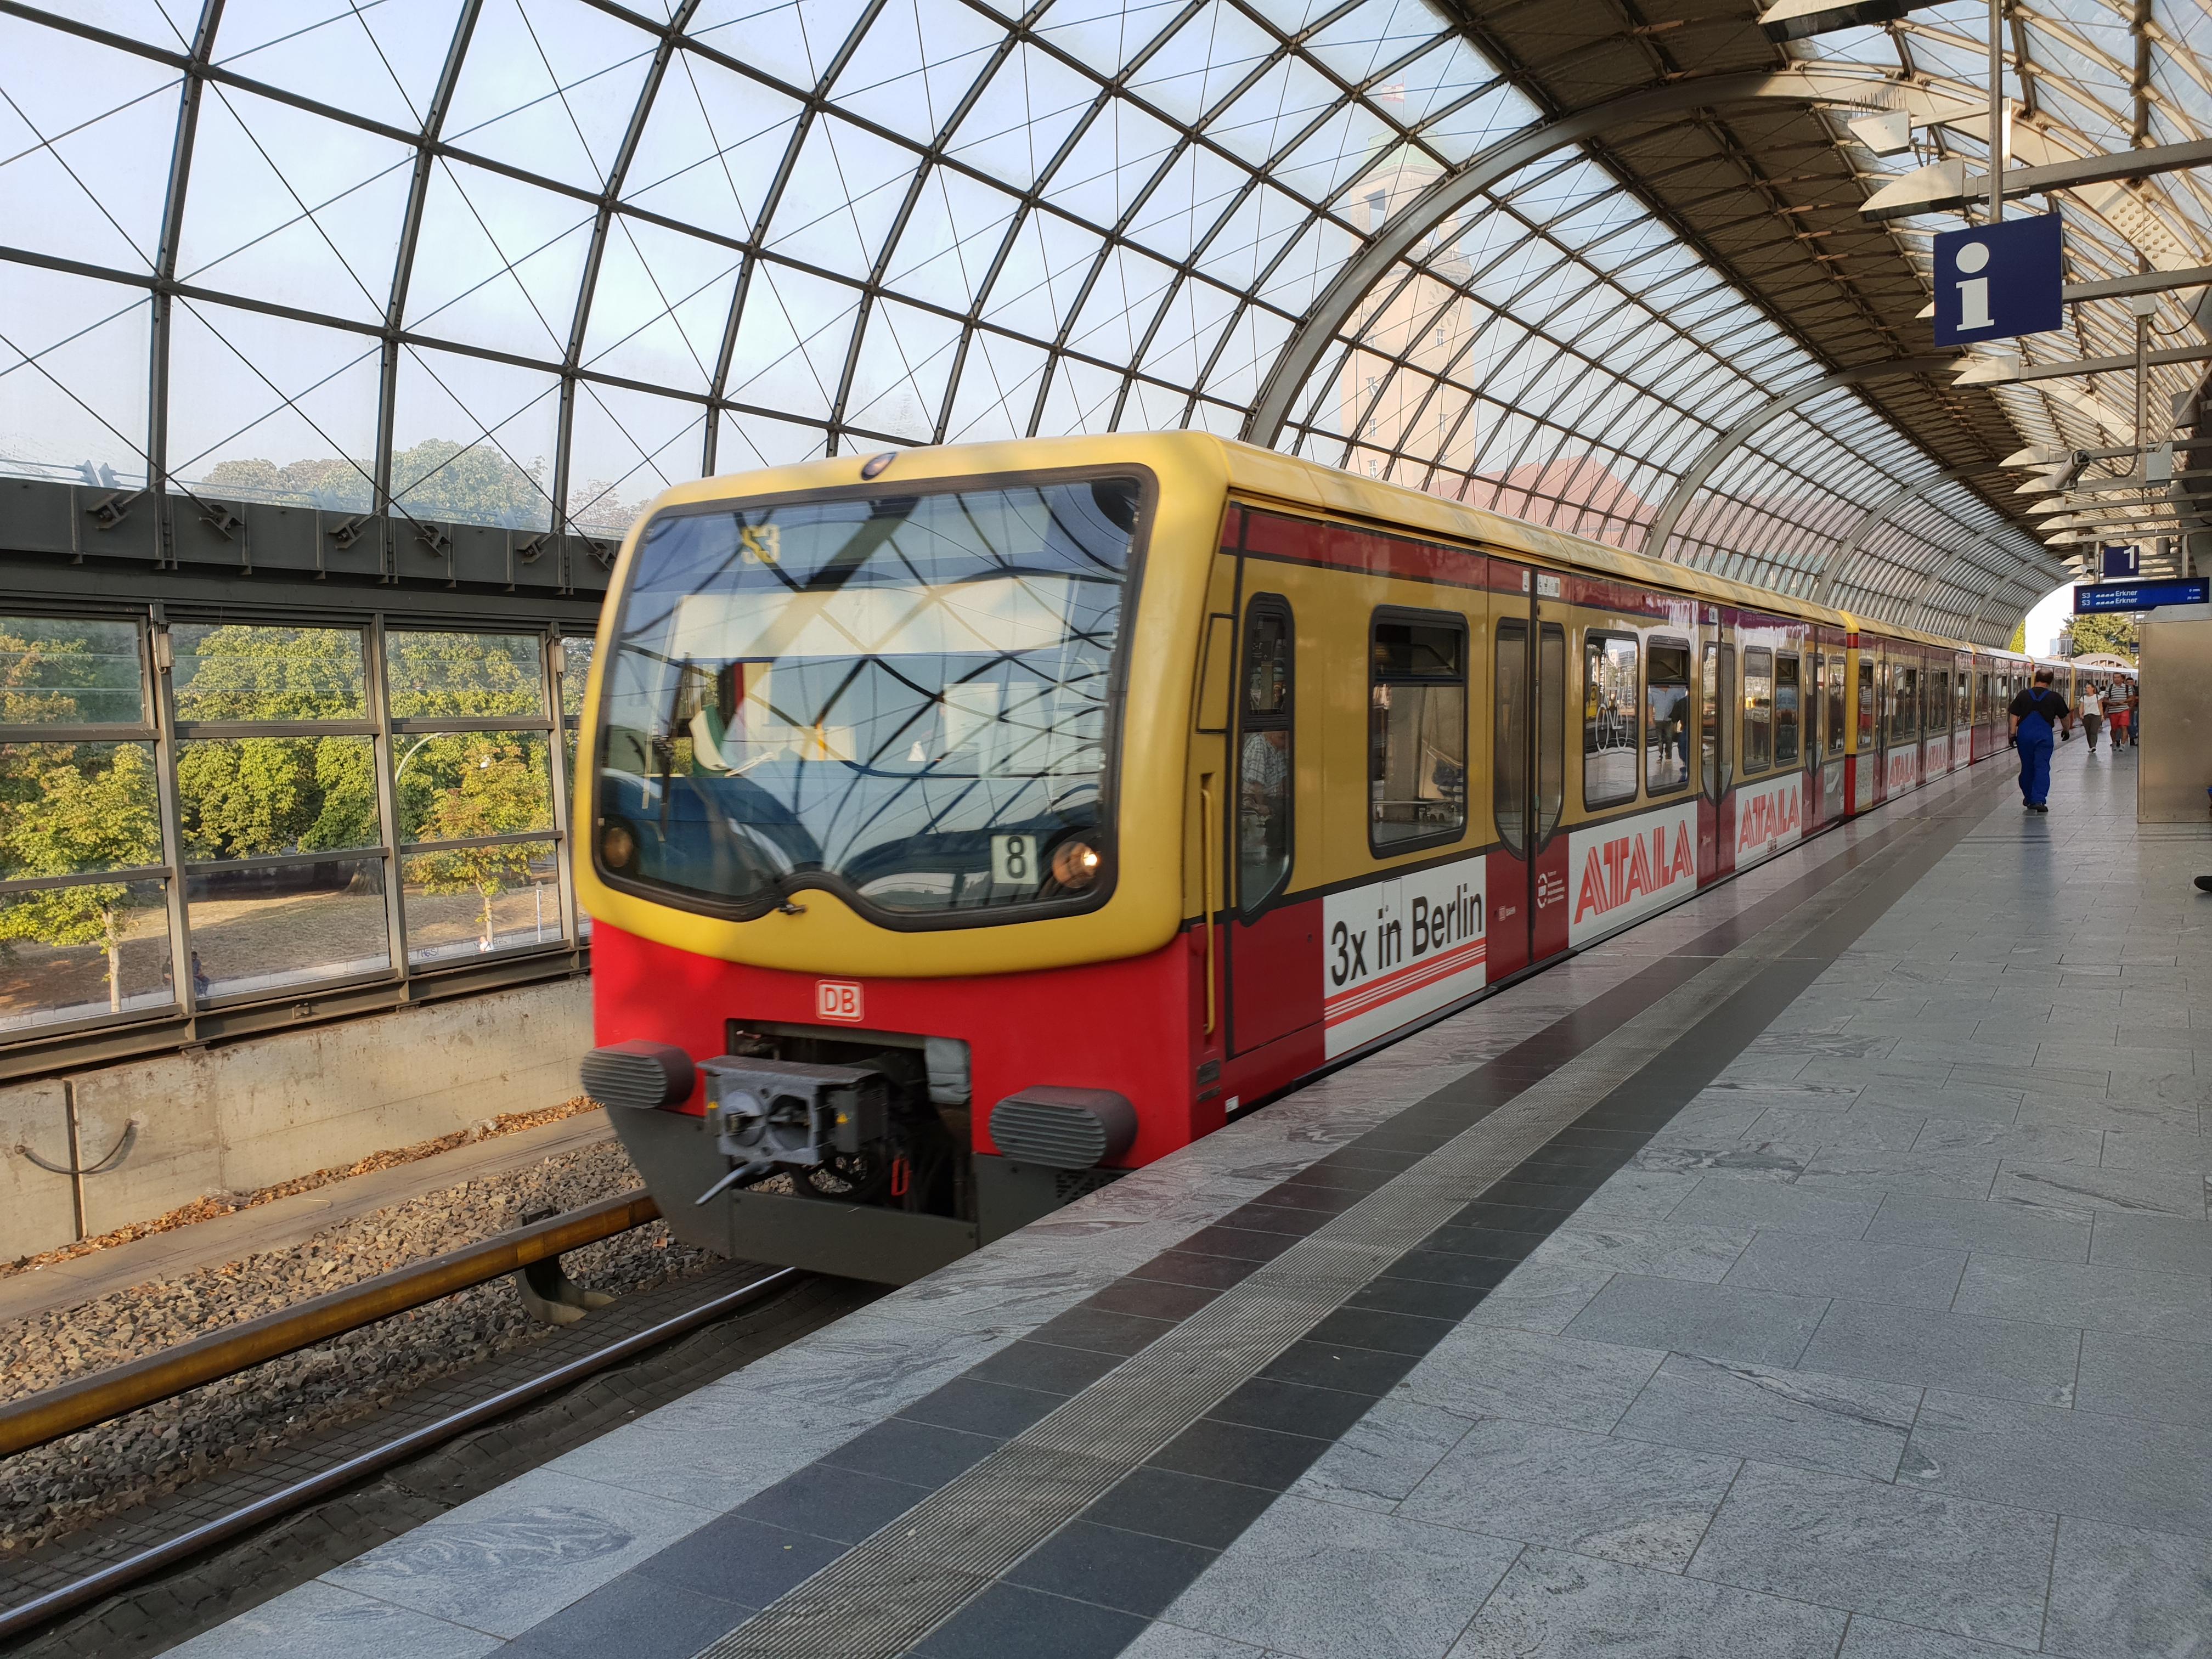 "Foto:S-Bahn 481 188, Baureihe481/482, ""Atala"", Spandau, 2018"